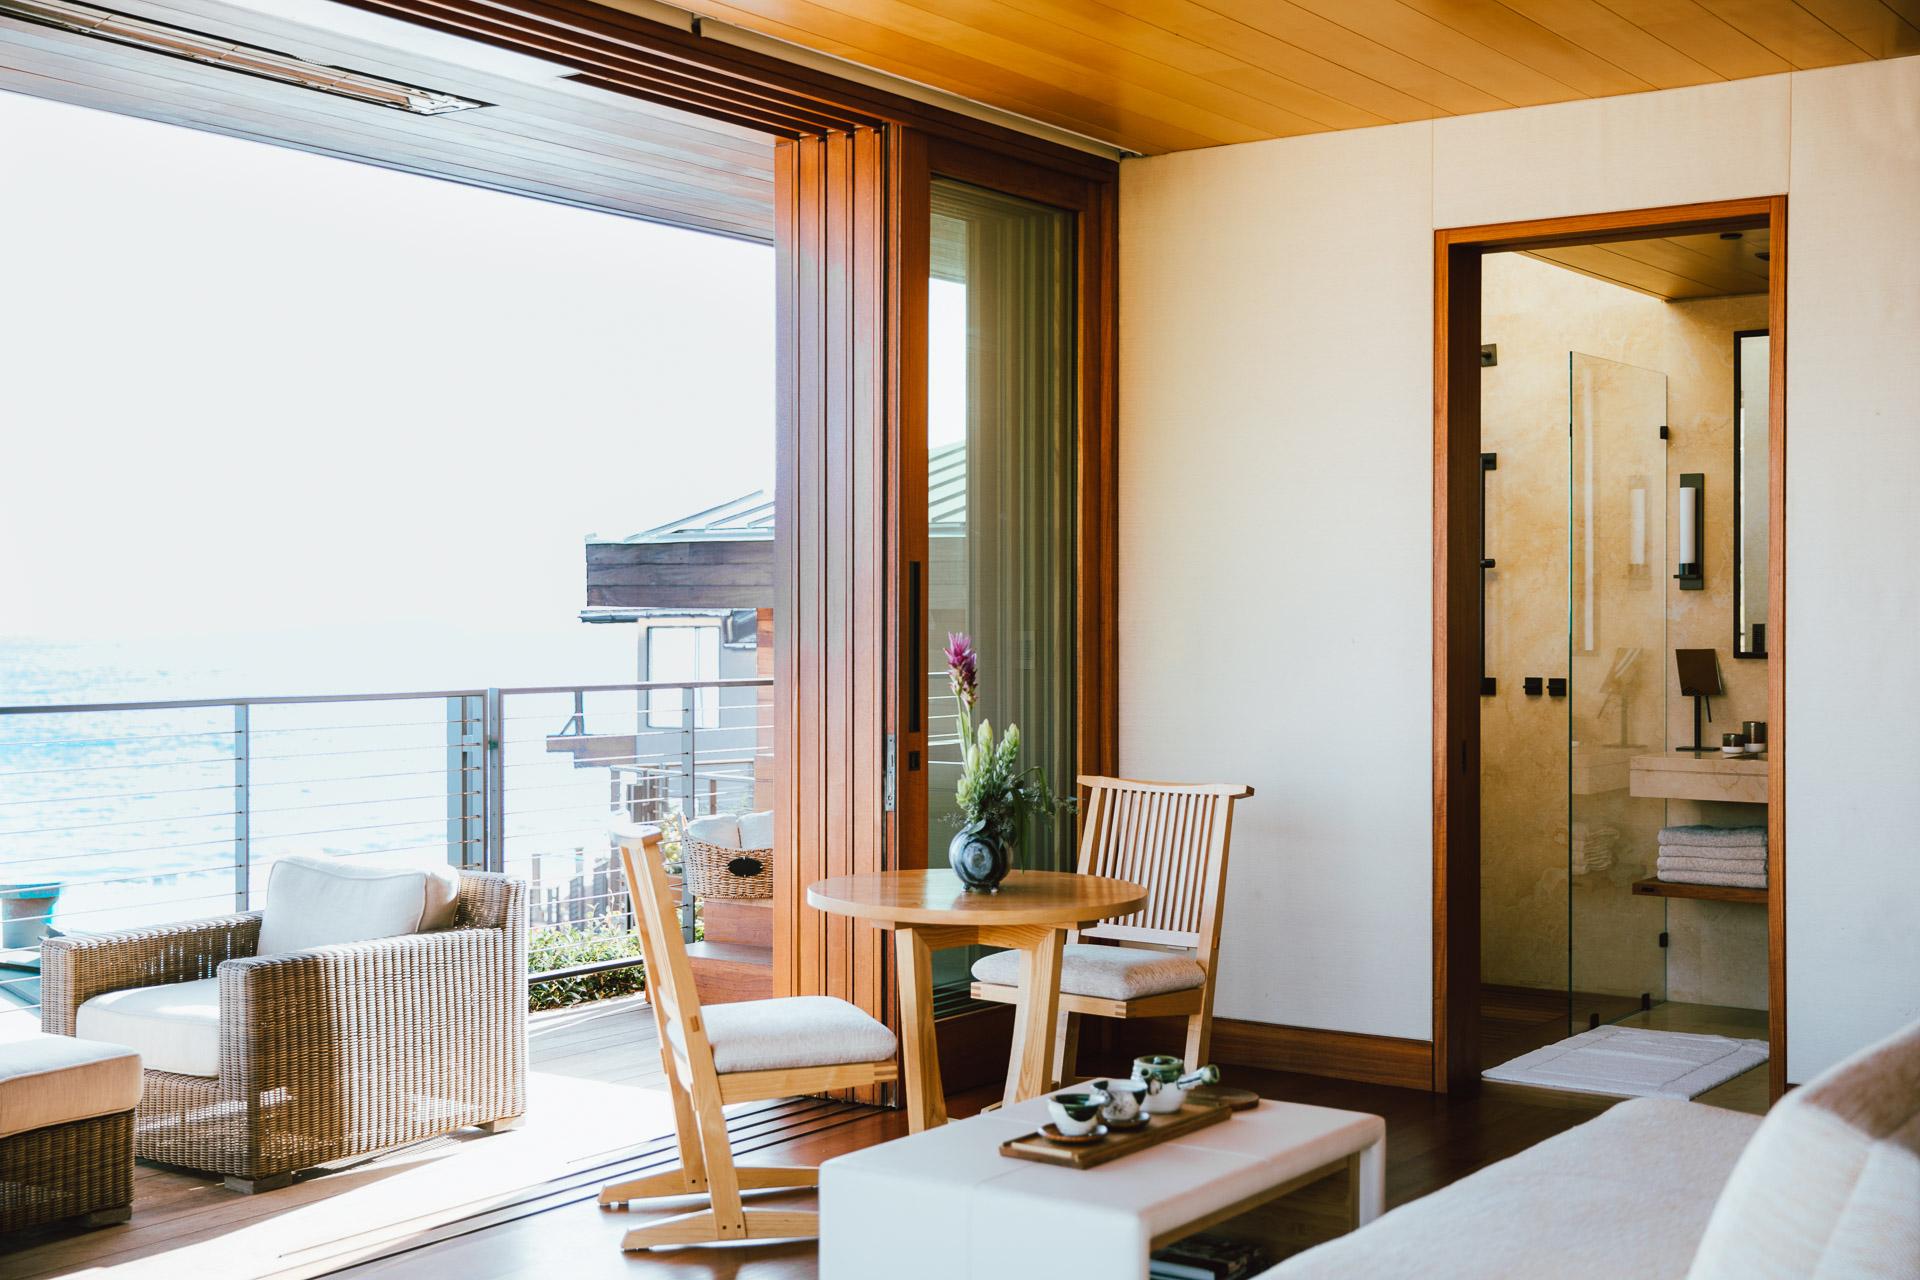 nobu-ryokan-malibu-california-luxury-hotel-photographer-los-angeles-8.jpg